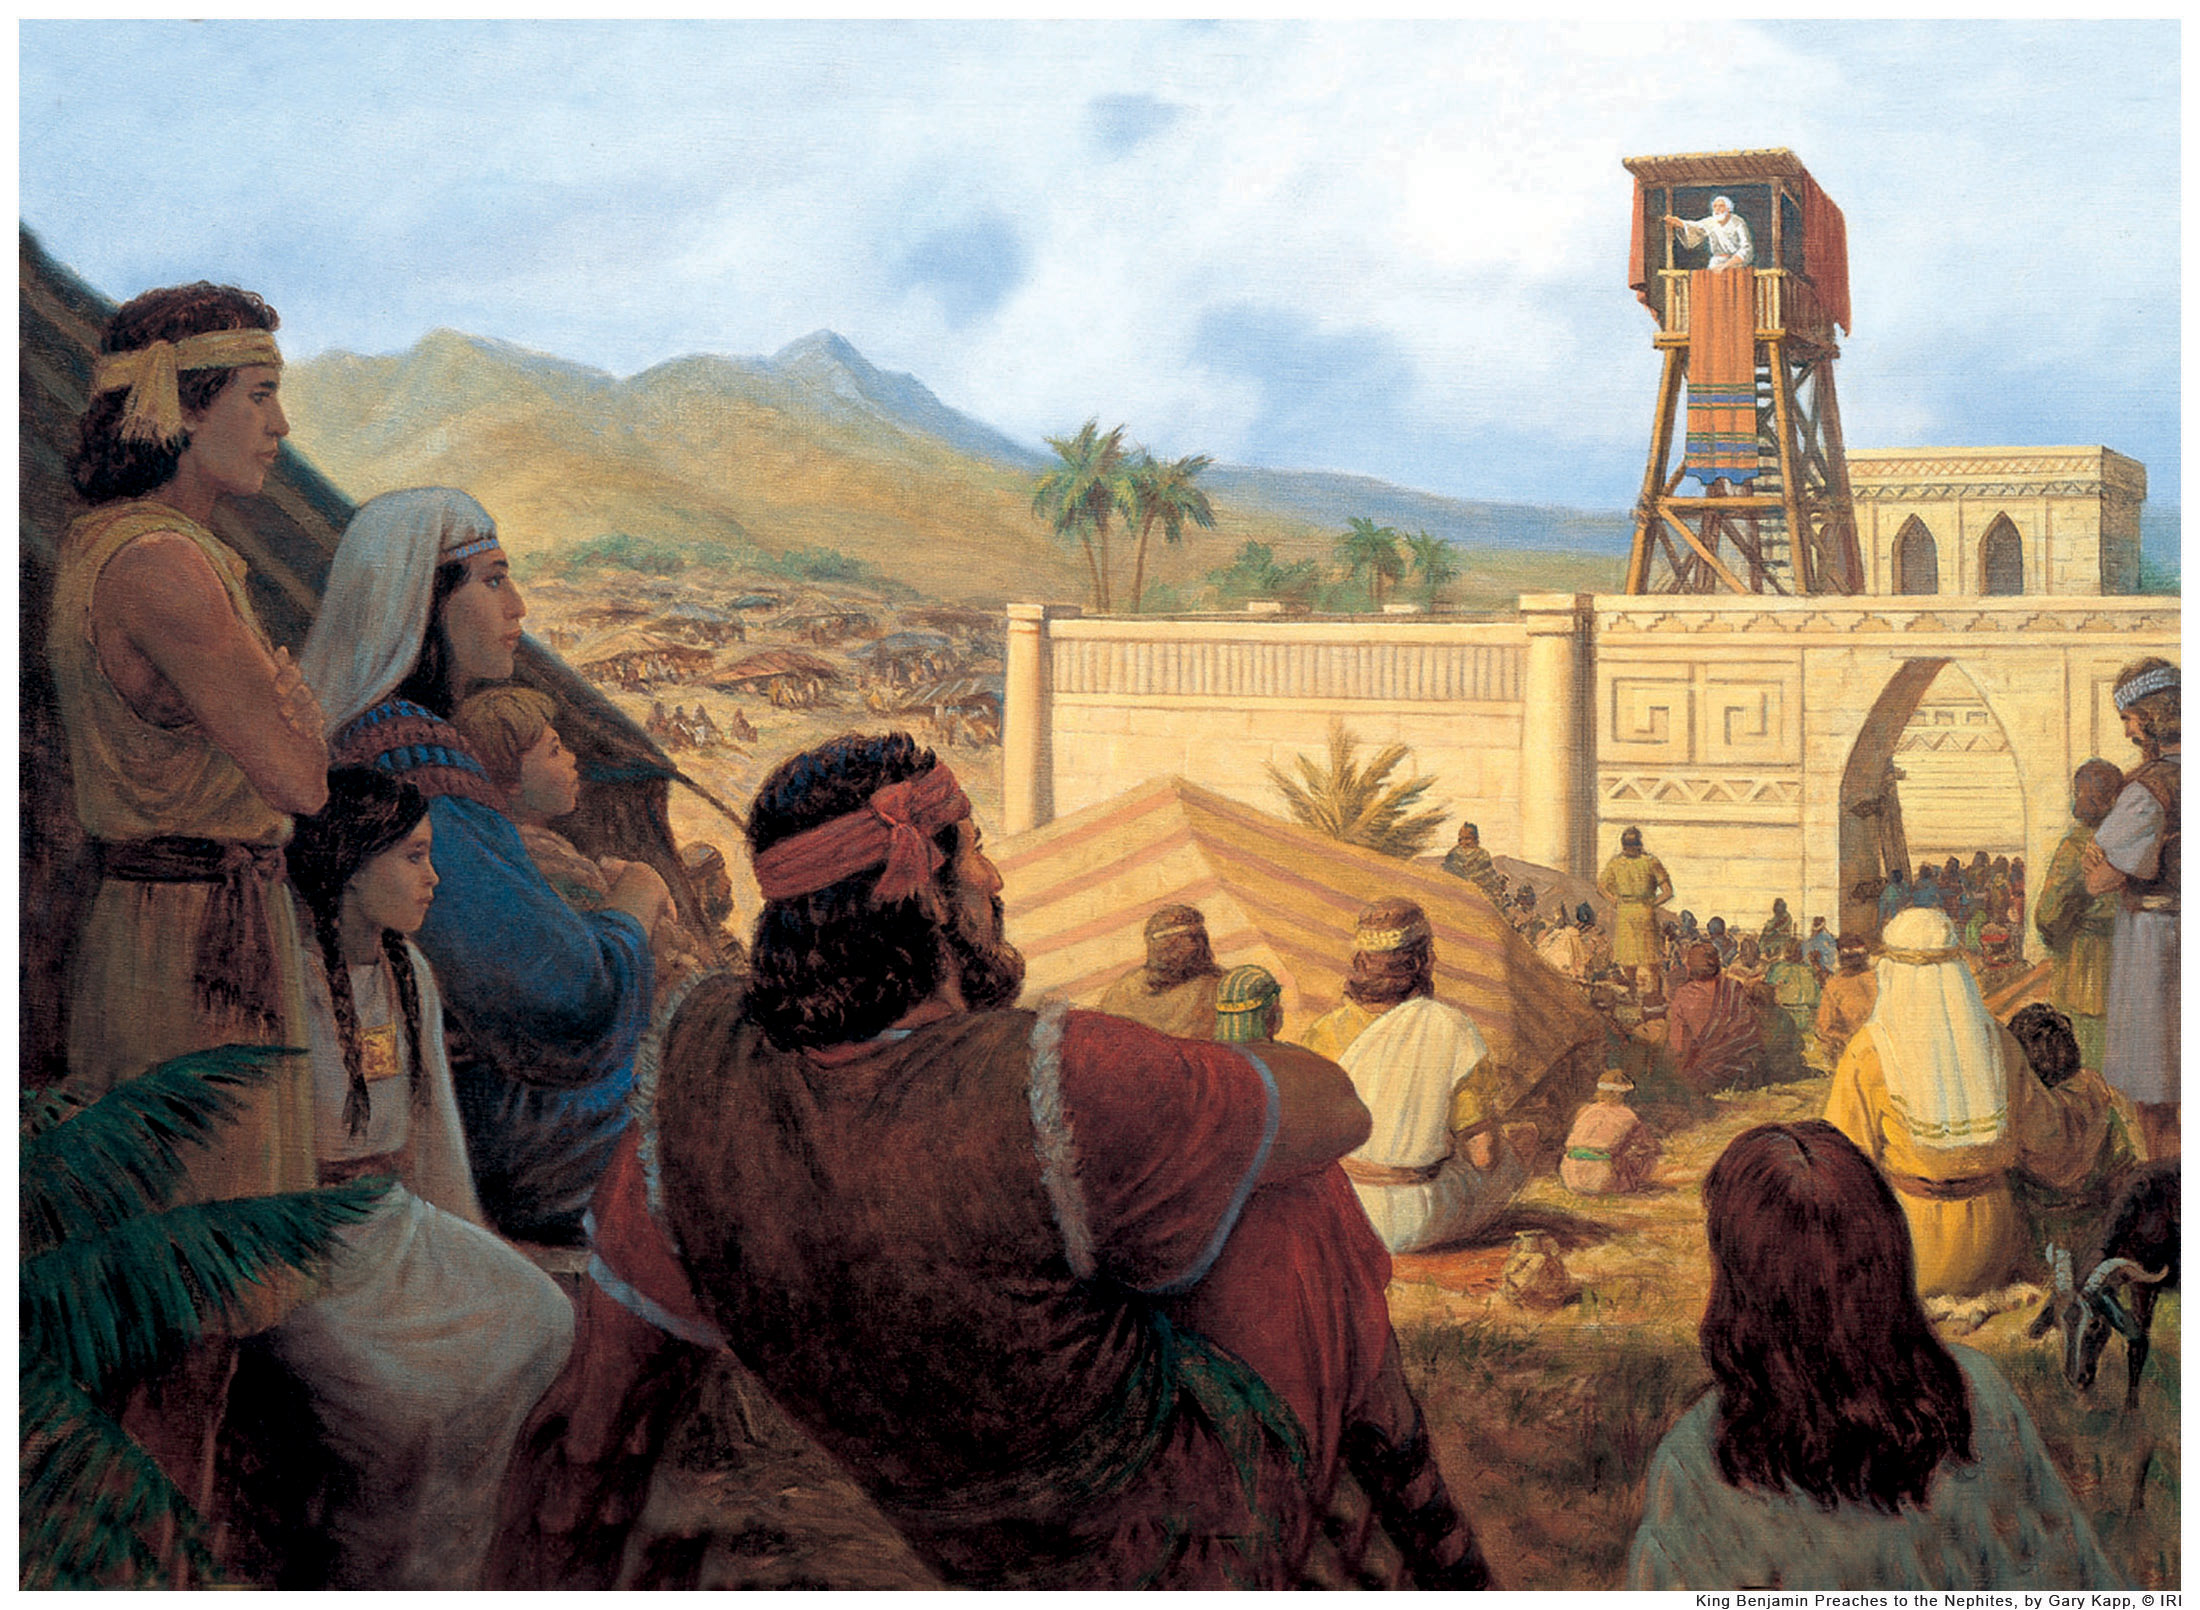 King Benjamin Mormon